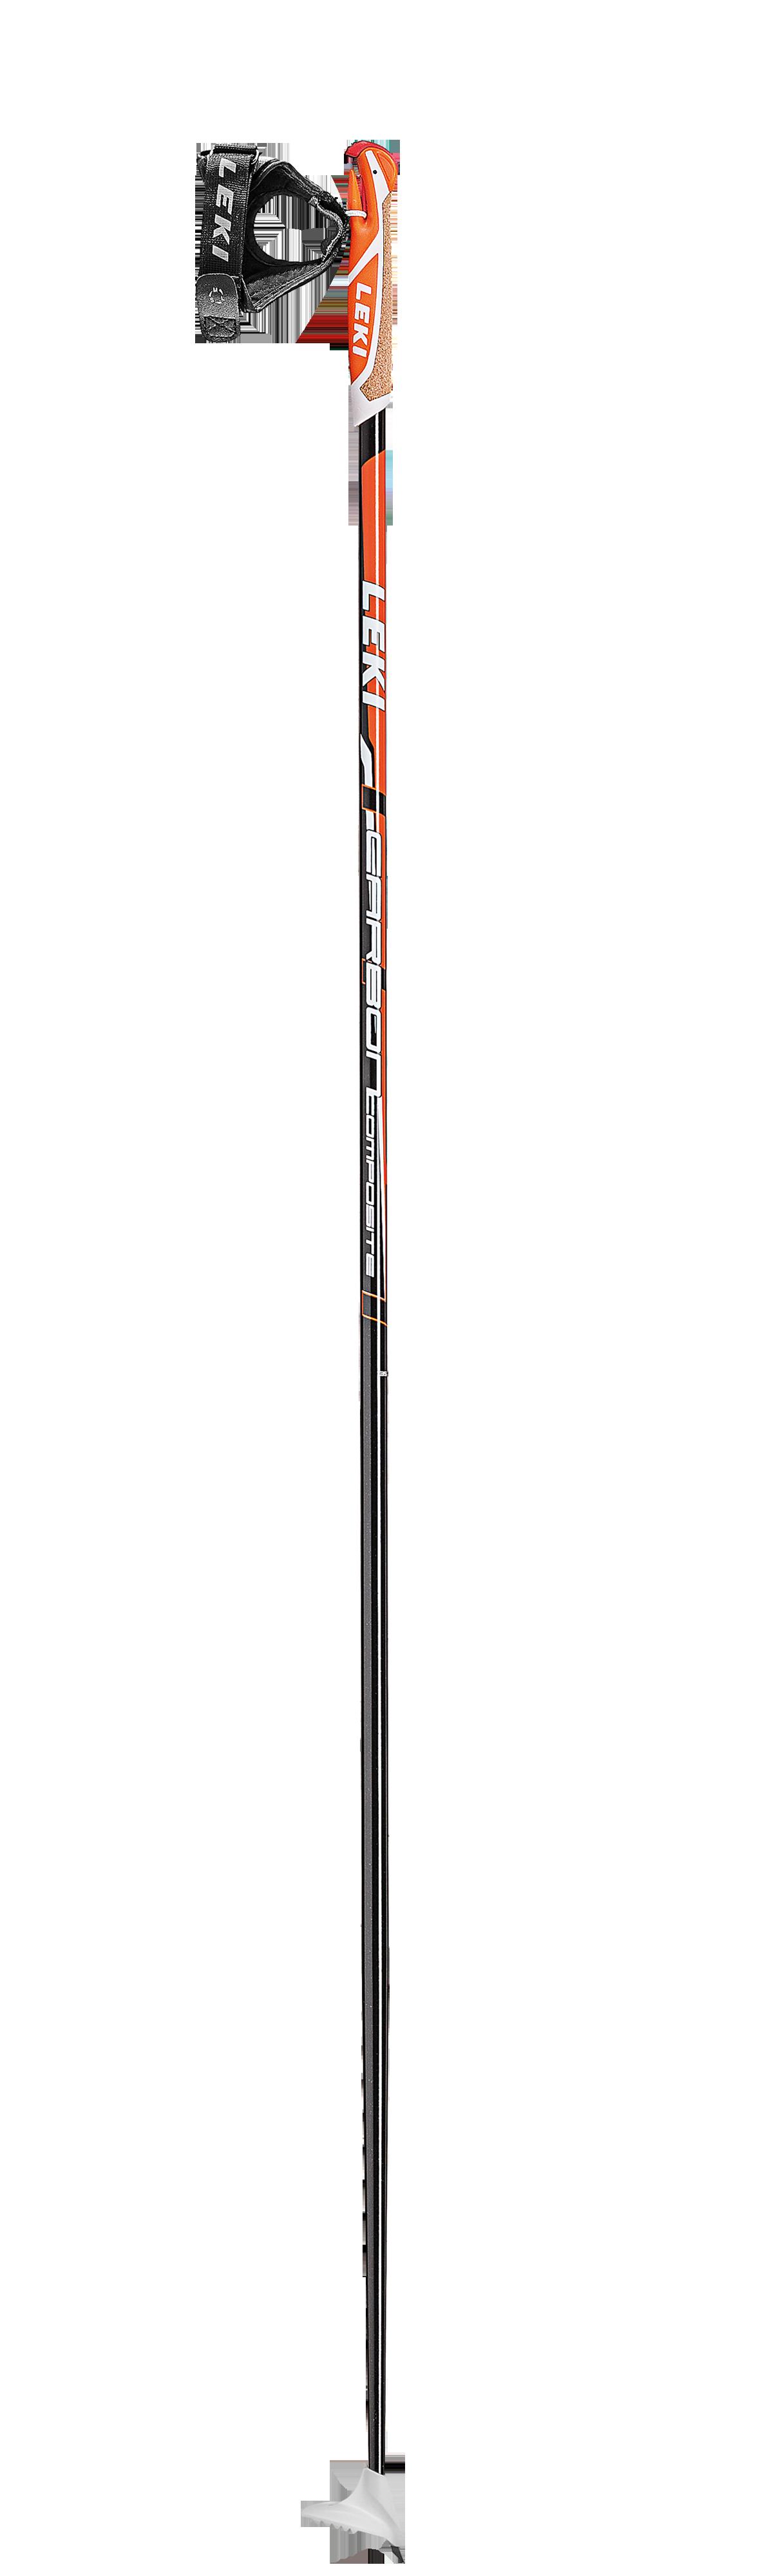 Skistöcke Carbon Comp, mehrfarbig, 150